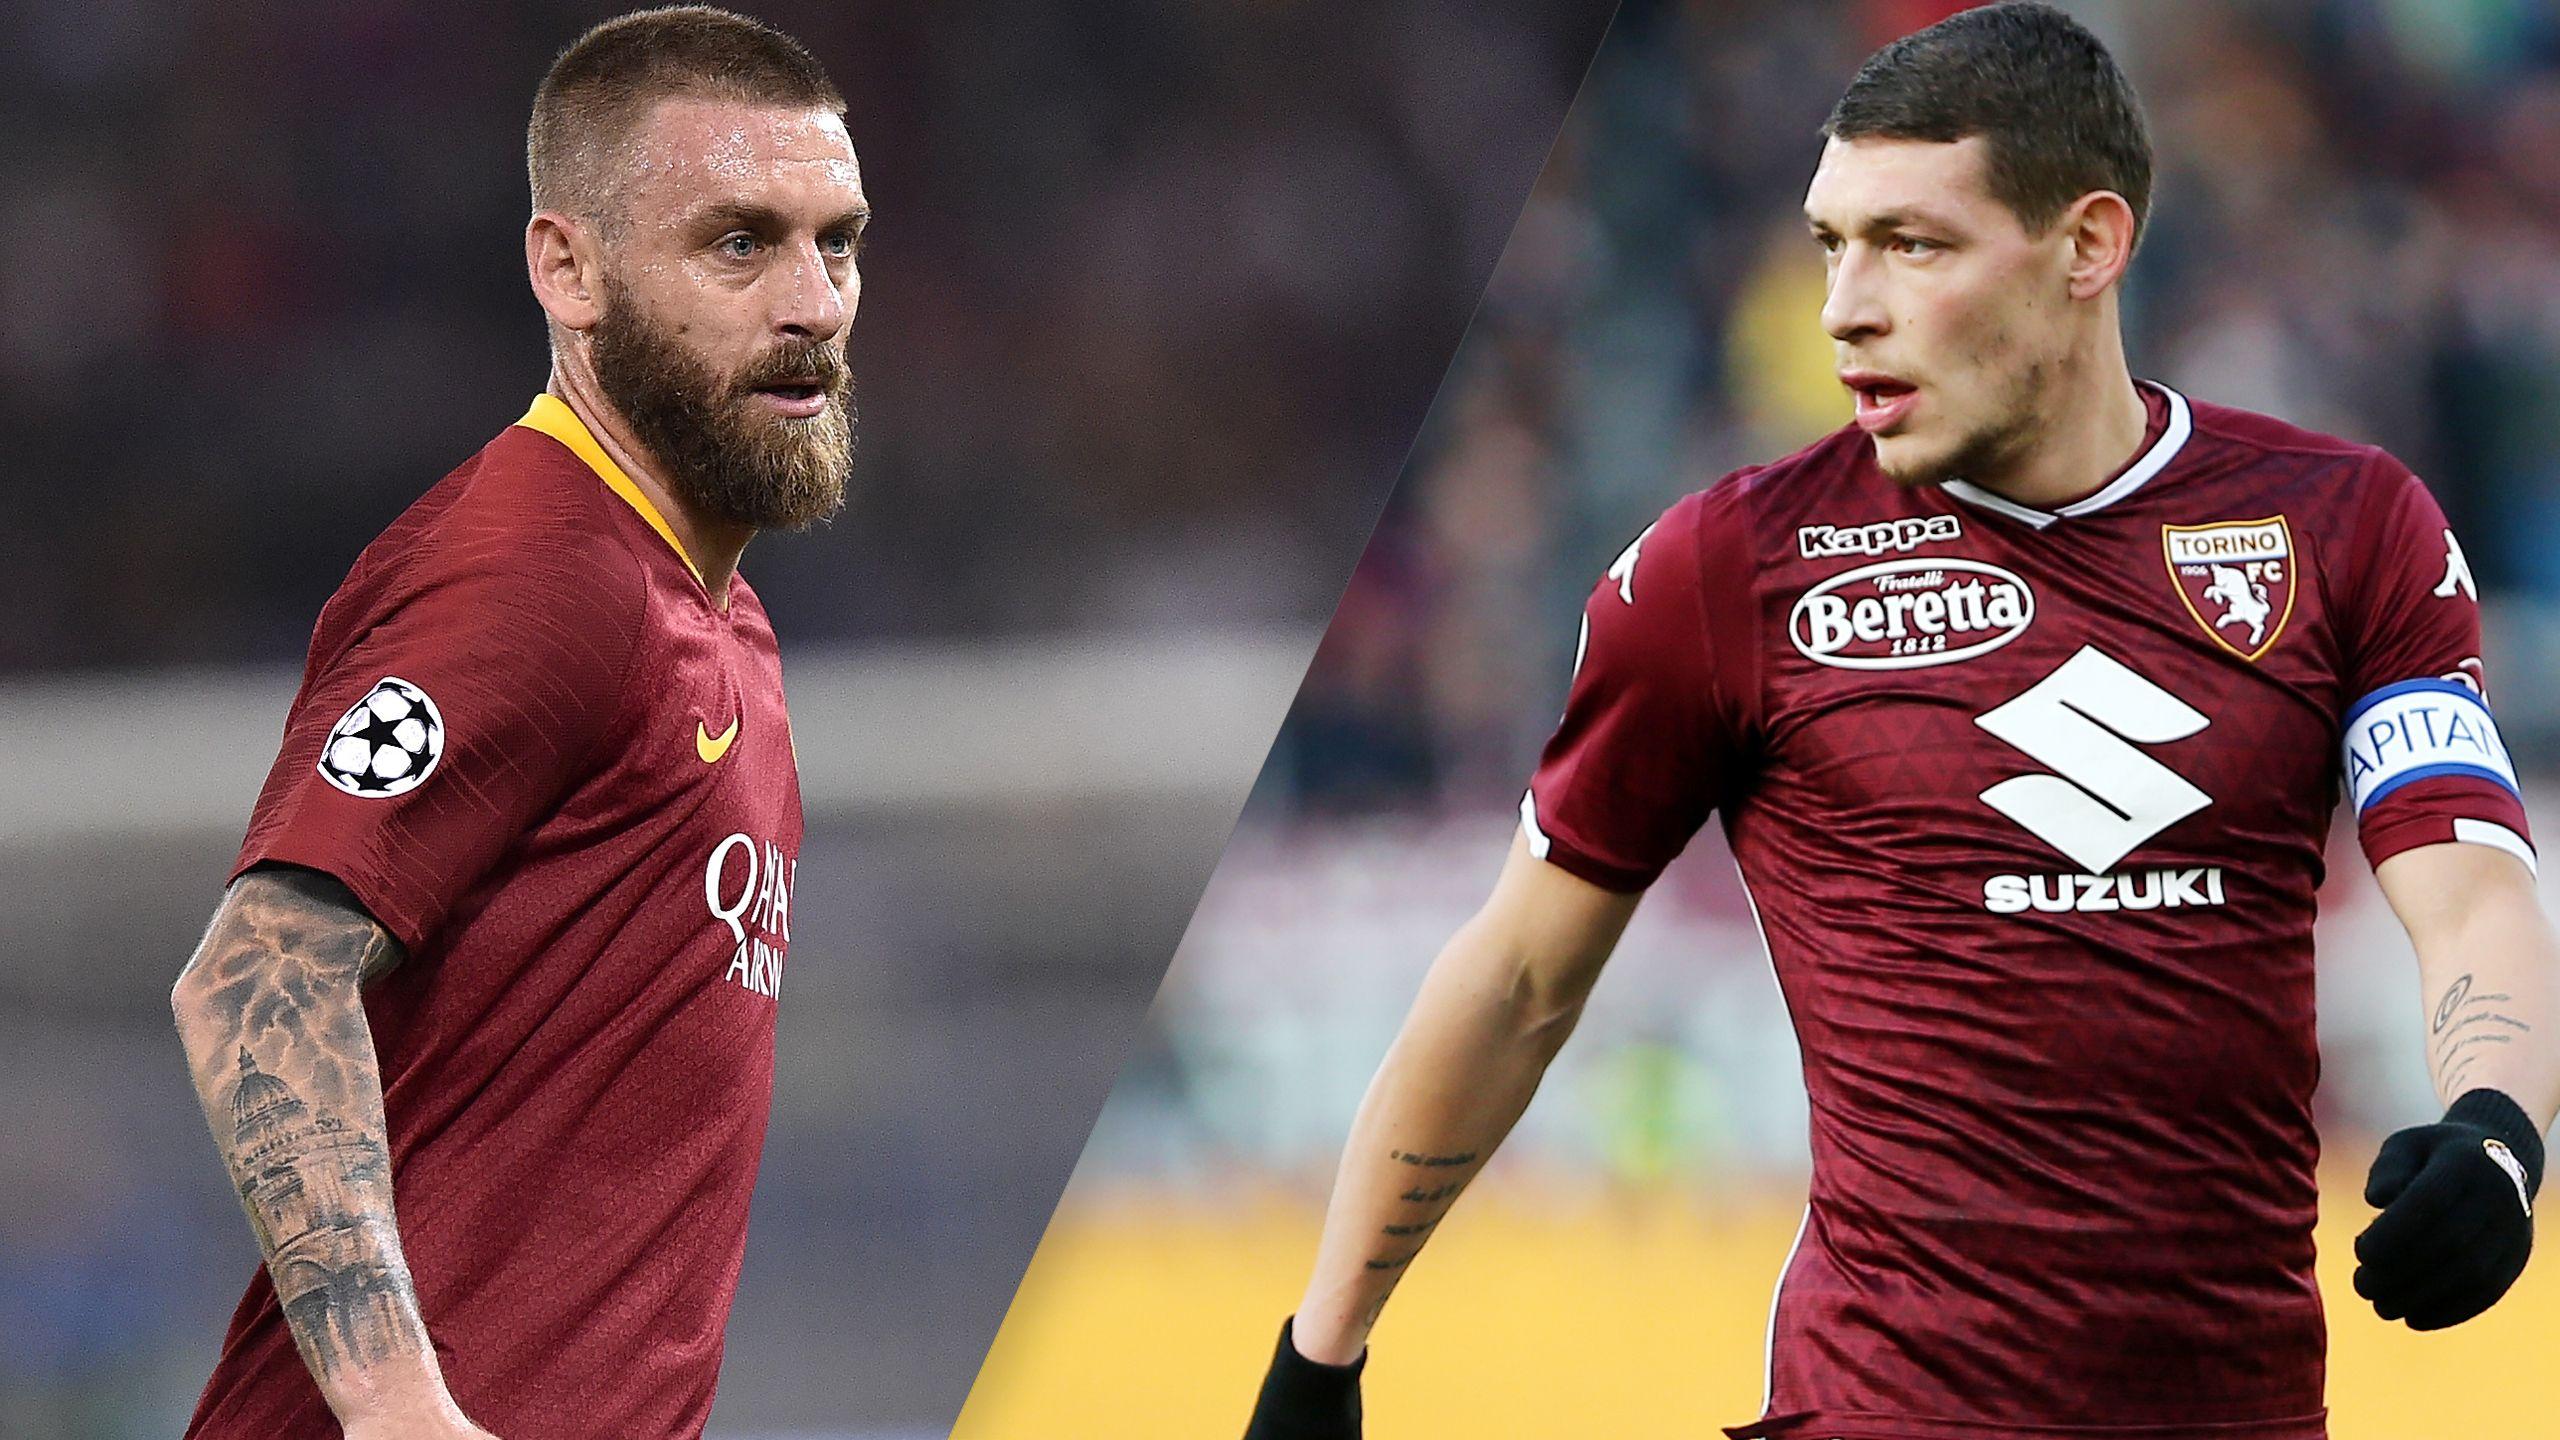 Roma vs. Torino